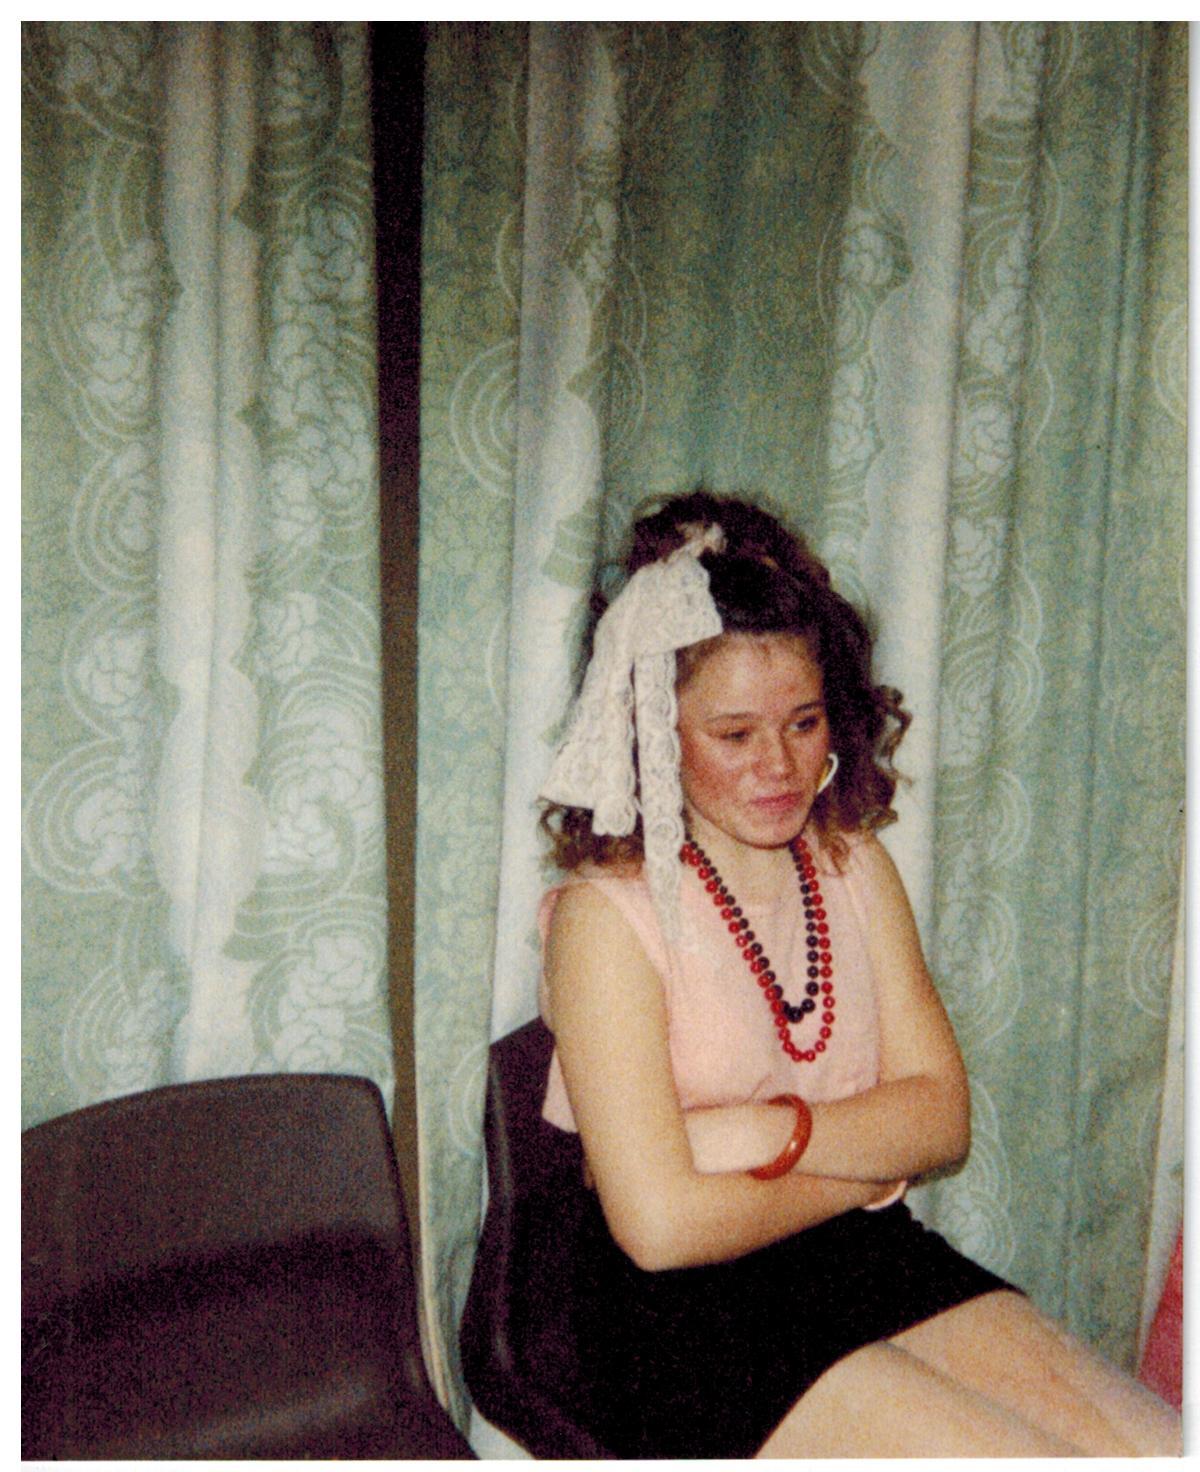 E011 Christmas Party 1990